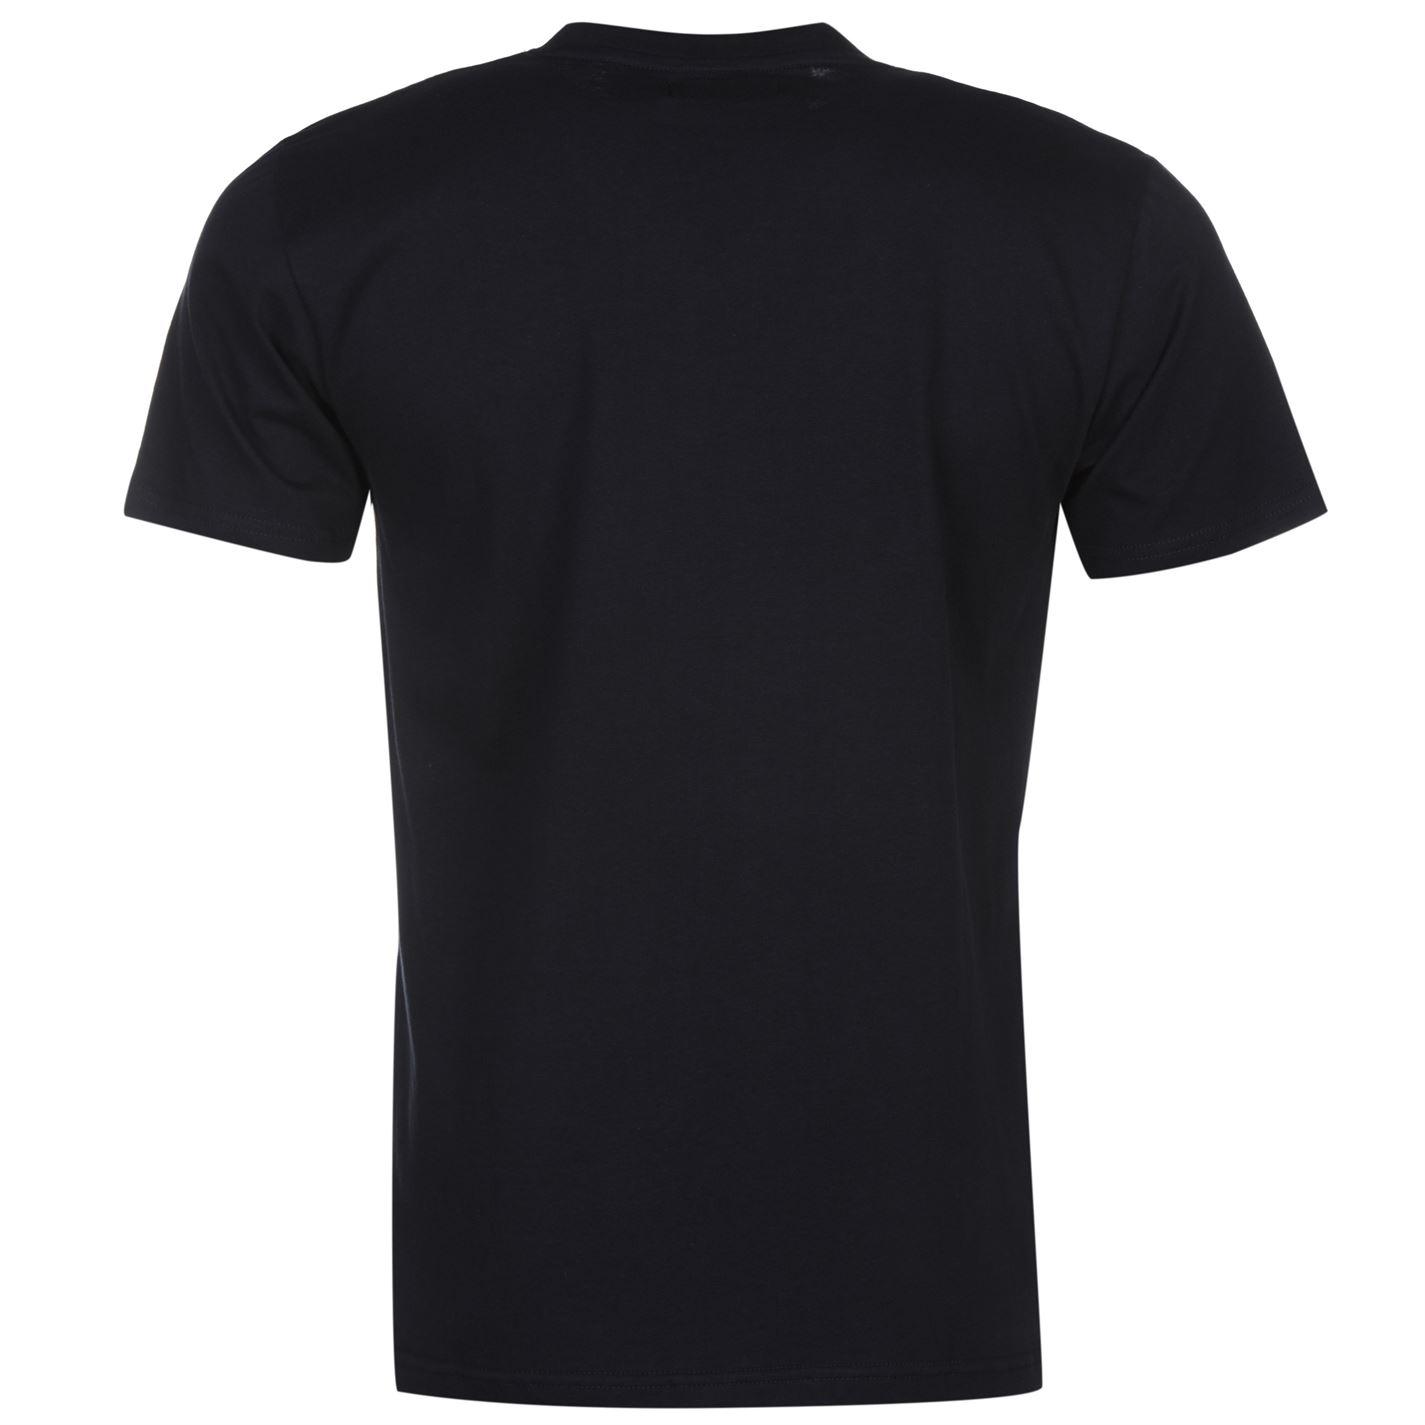 Pierre Cardin Gents Mens V-Neck T-Shirt Short Sleeve Tee Top